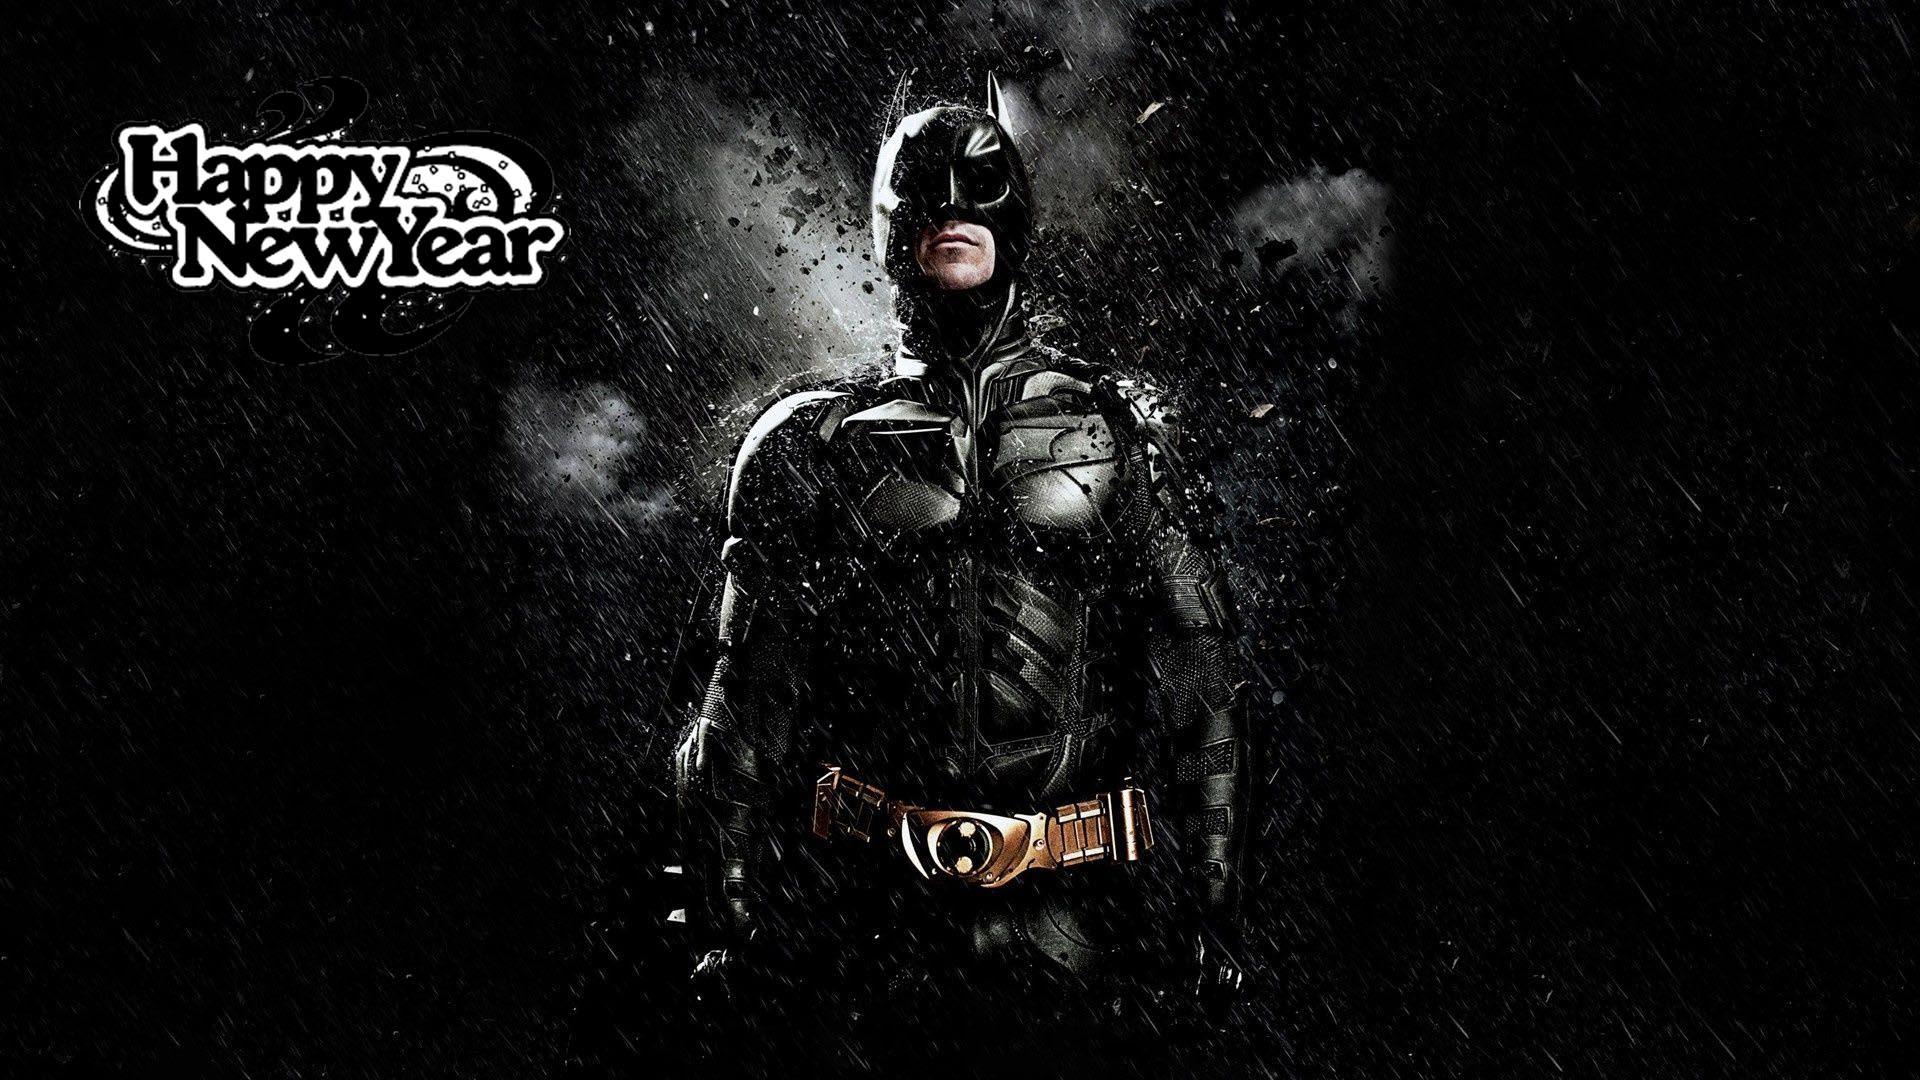 happy new year wishes super hero batman kids hd wallpaper